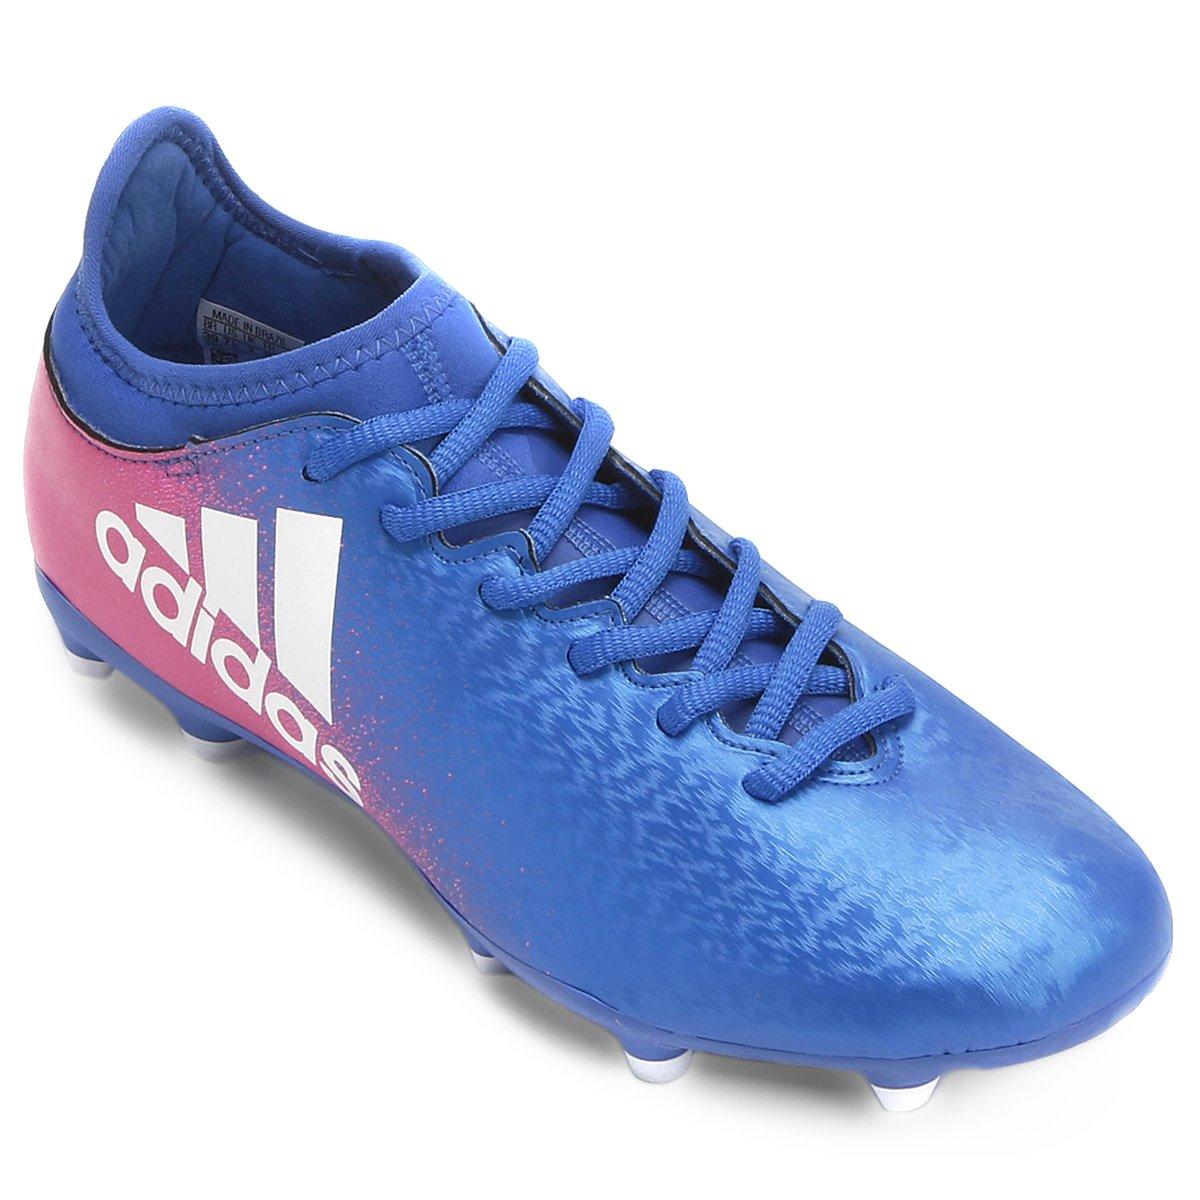 Chuteira Campo Adidas X 16.3 FG Masculina - Compre Agora  aefc2cb86029f